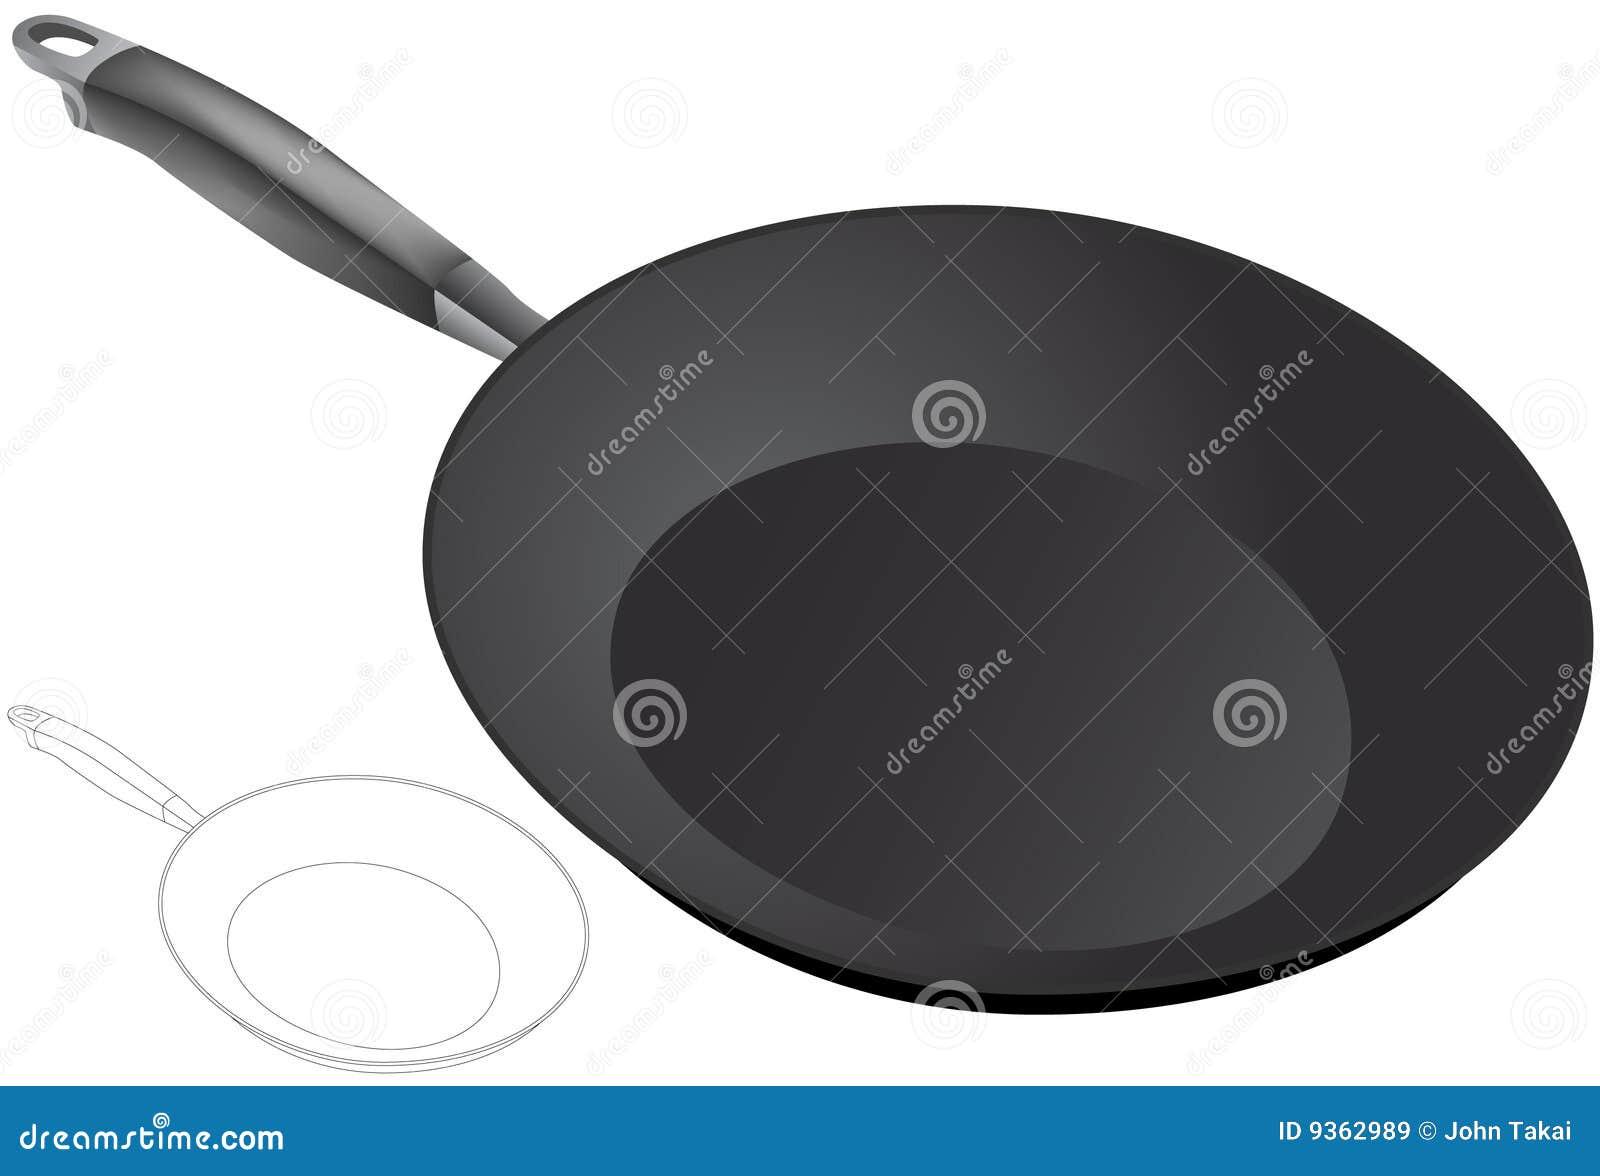 Frying Pan - 3D